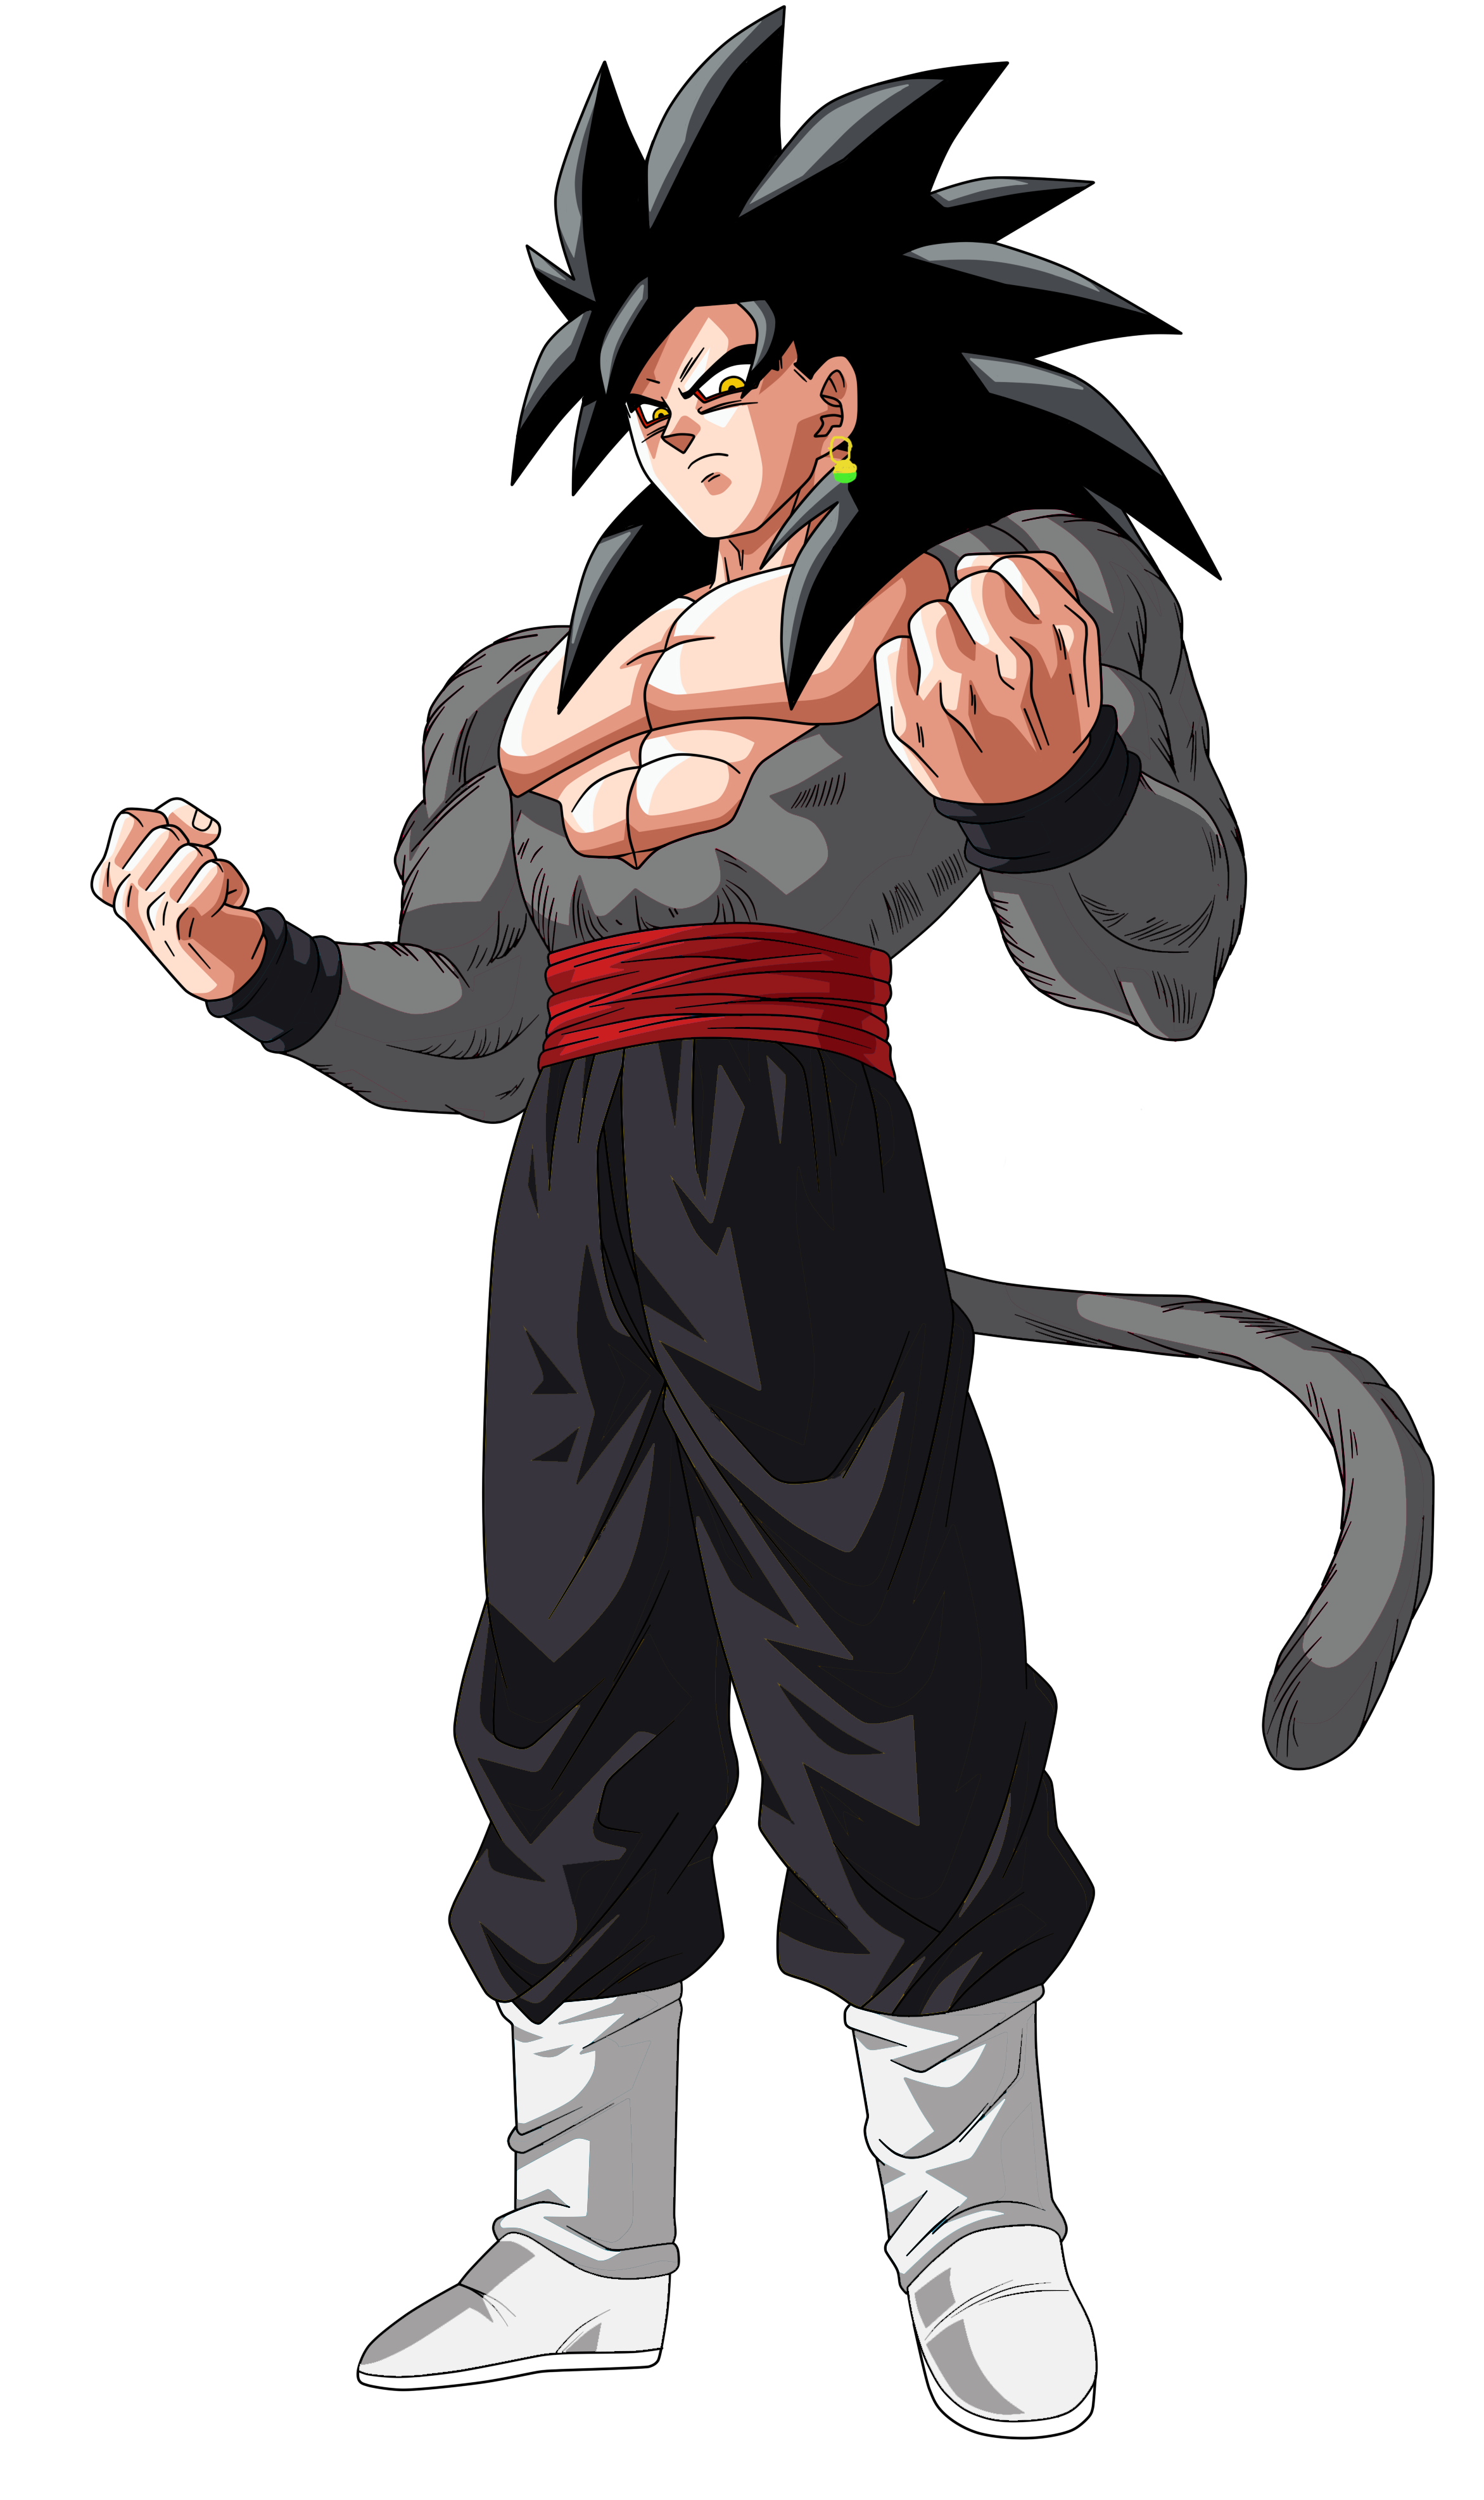 Super Saiyan 4 Goku Black V2